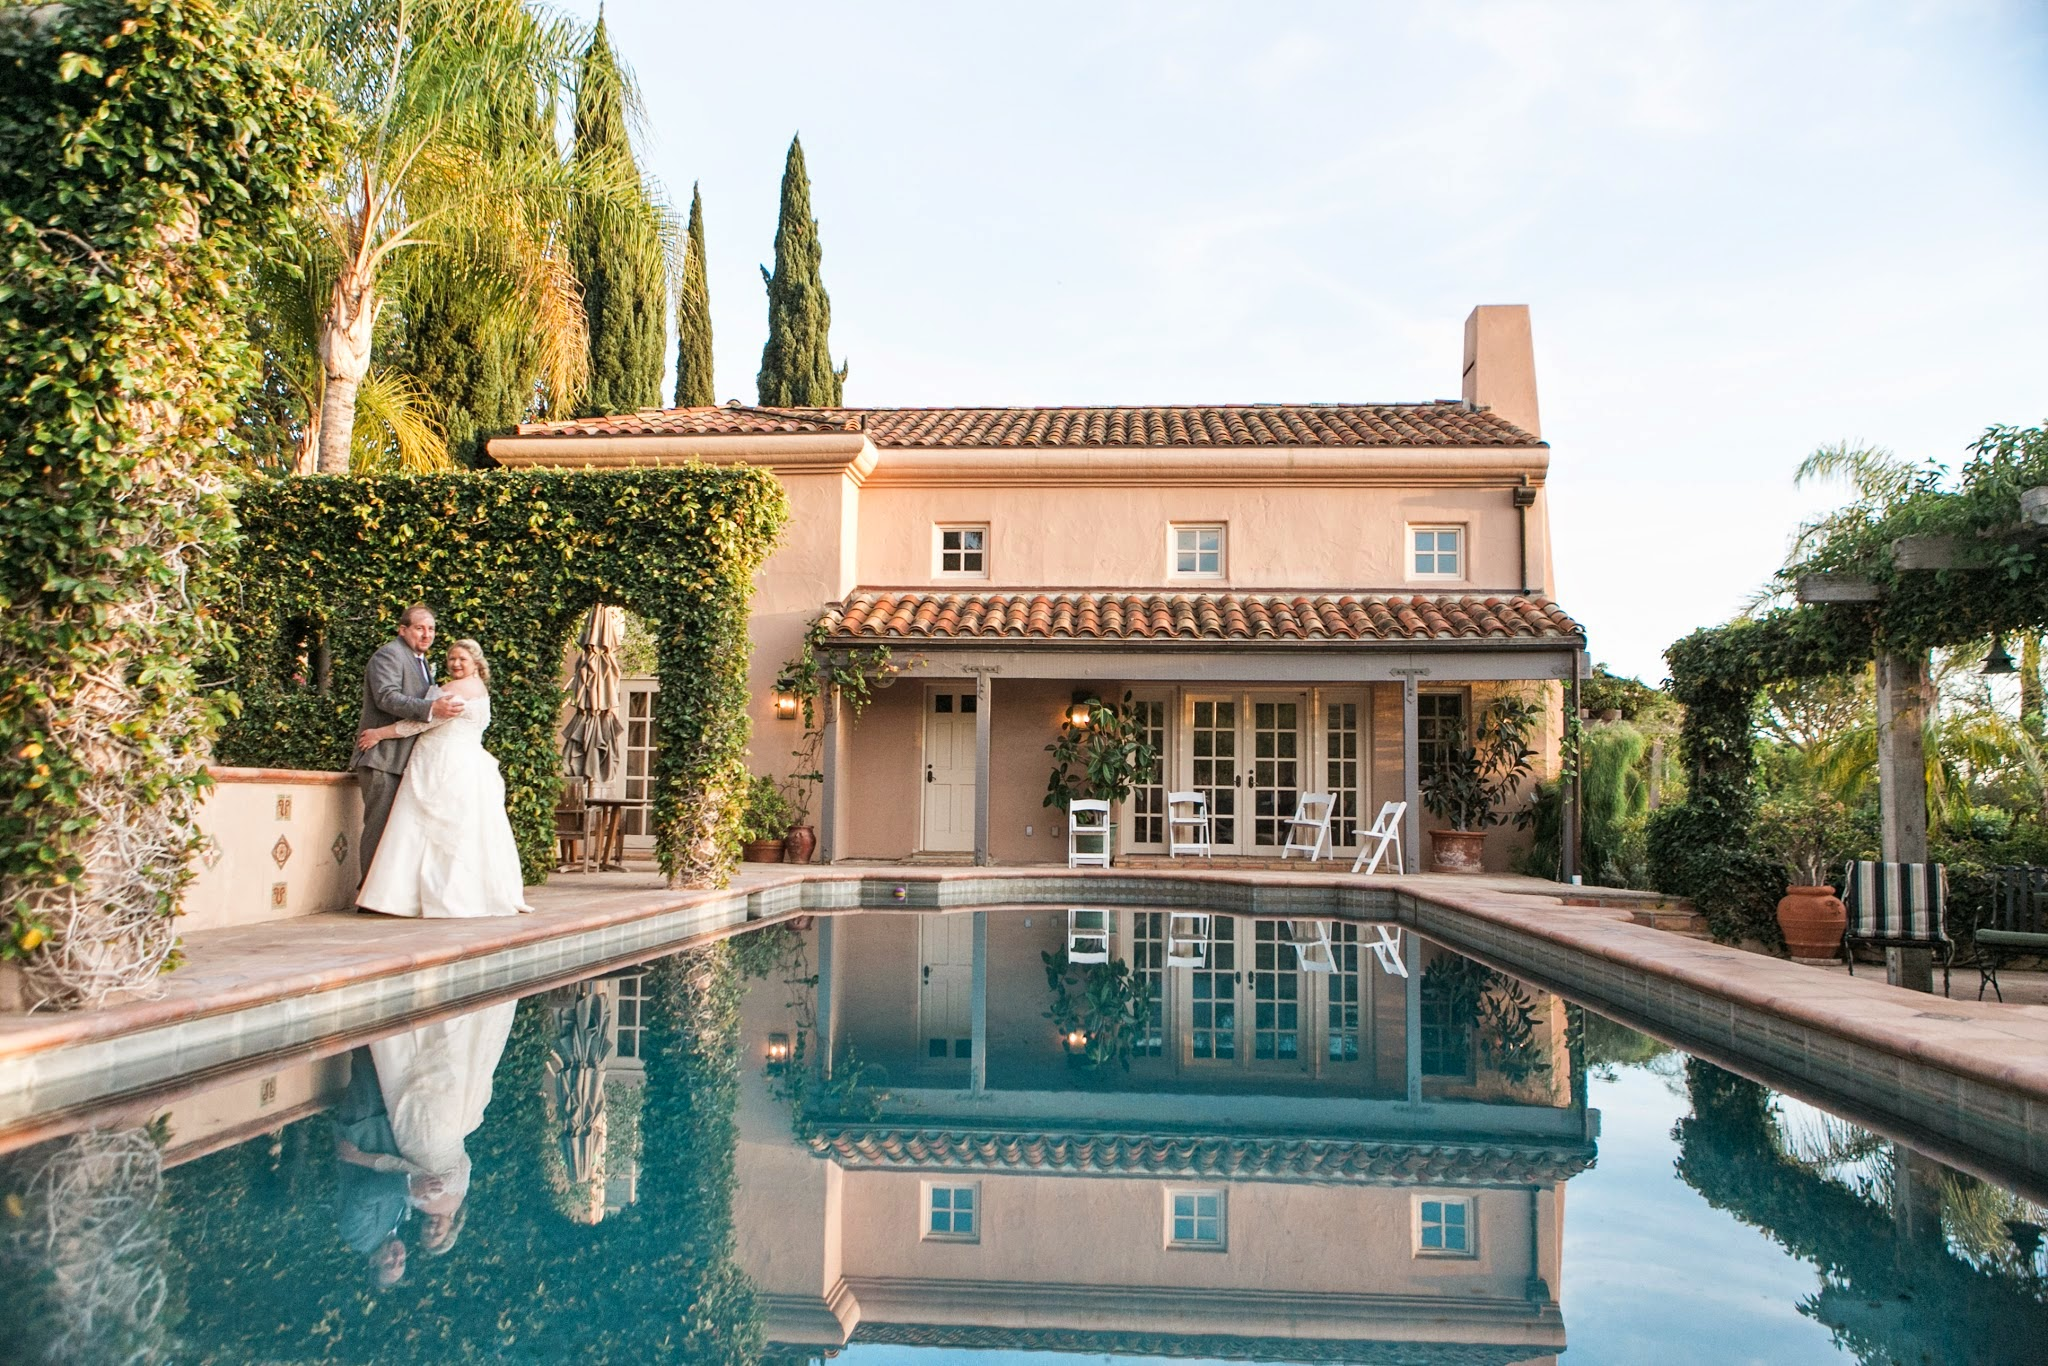 www.santabarbarawedding.com | Andrejka Photography | Villa Verano | Wedding Venue | Private Estate | Bride and Groom | Pool